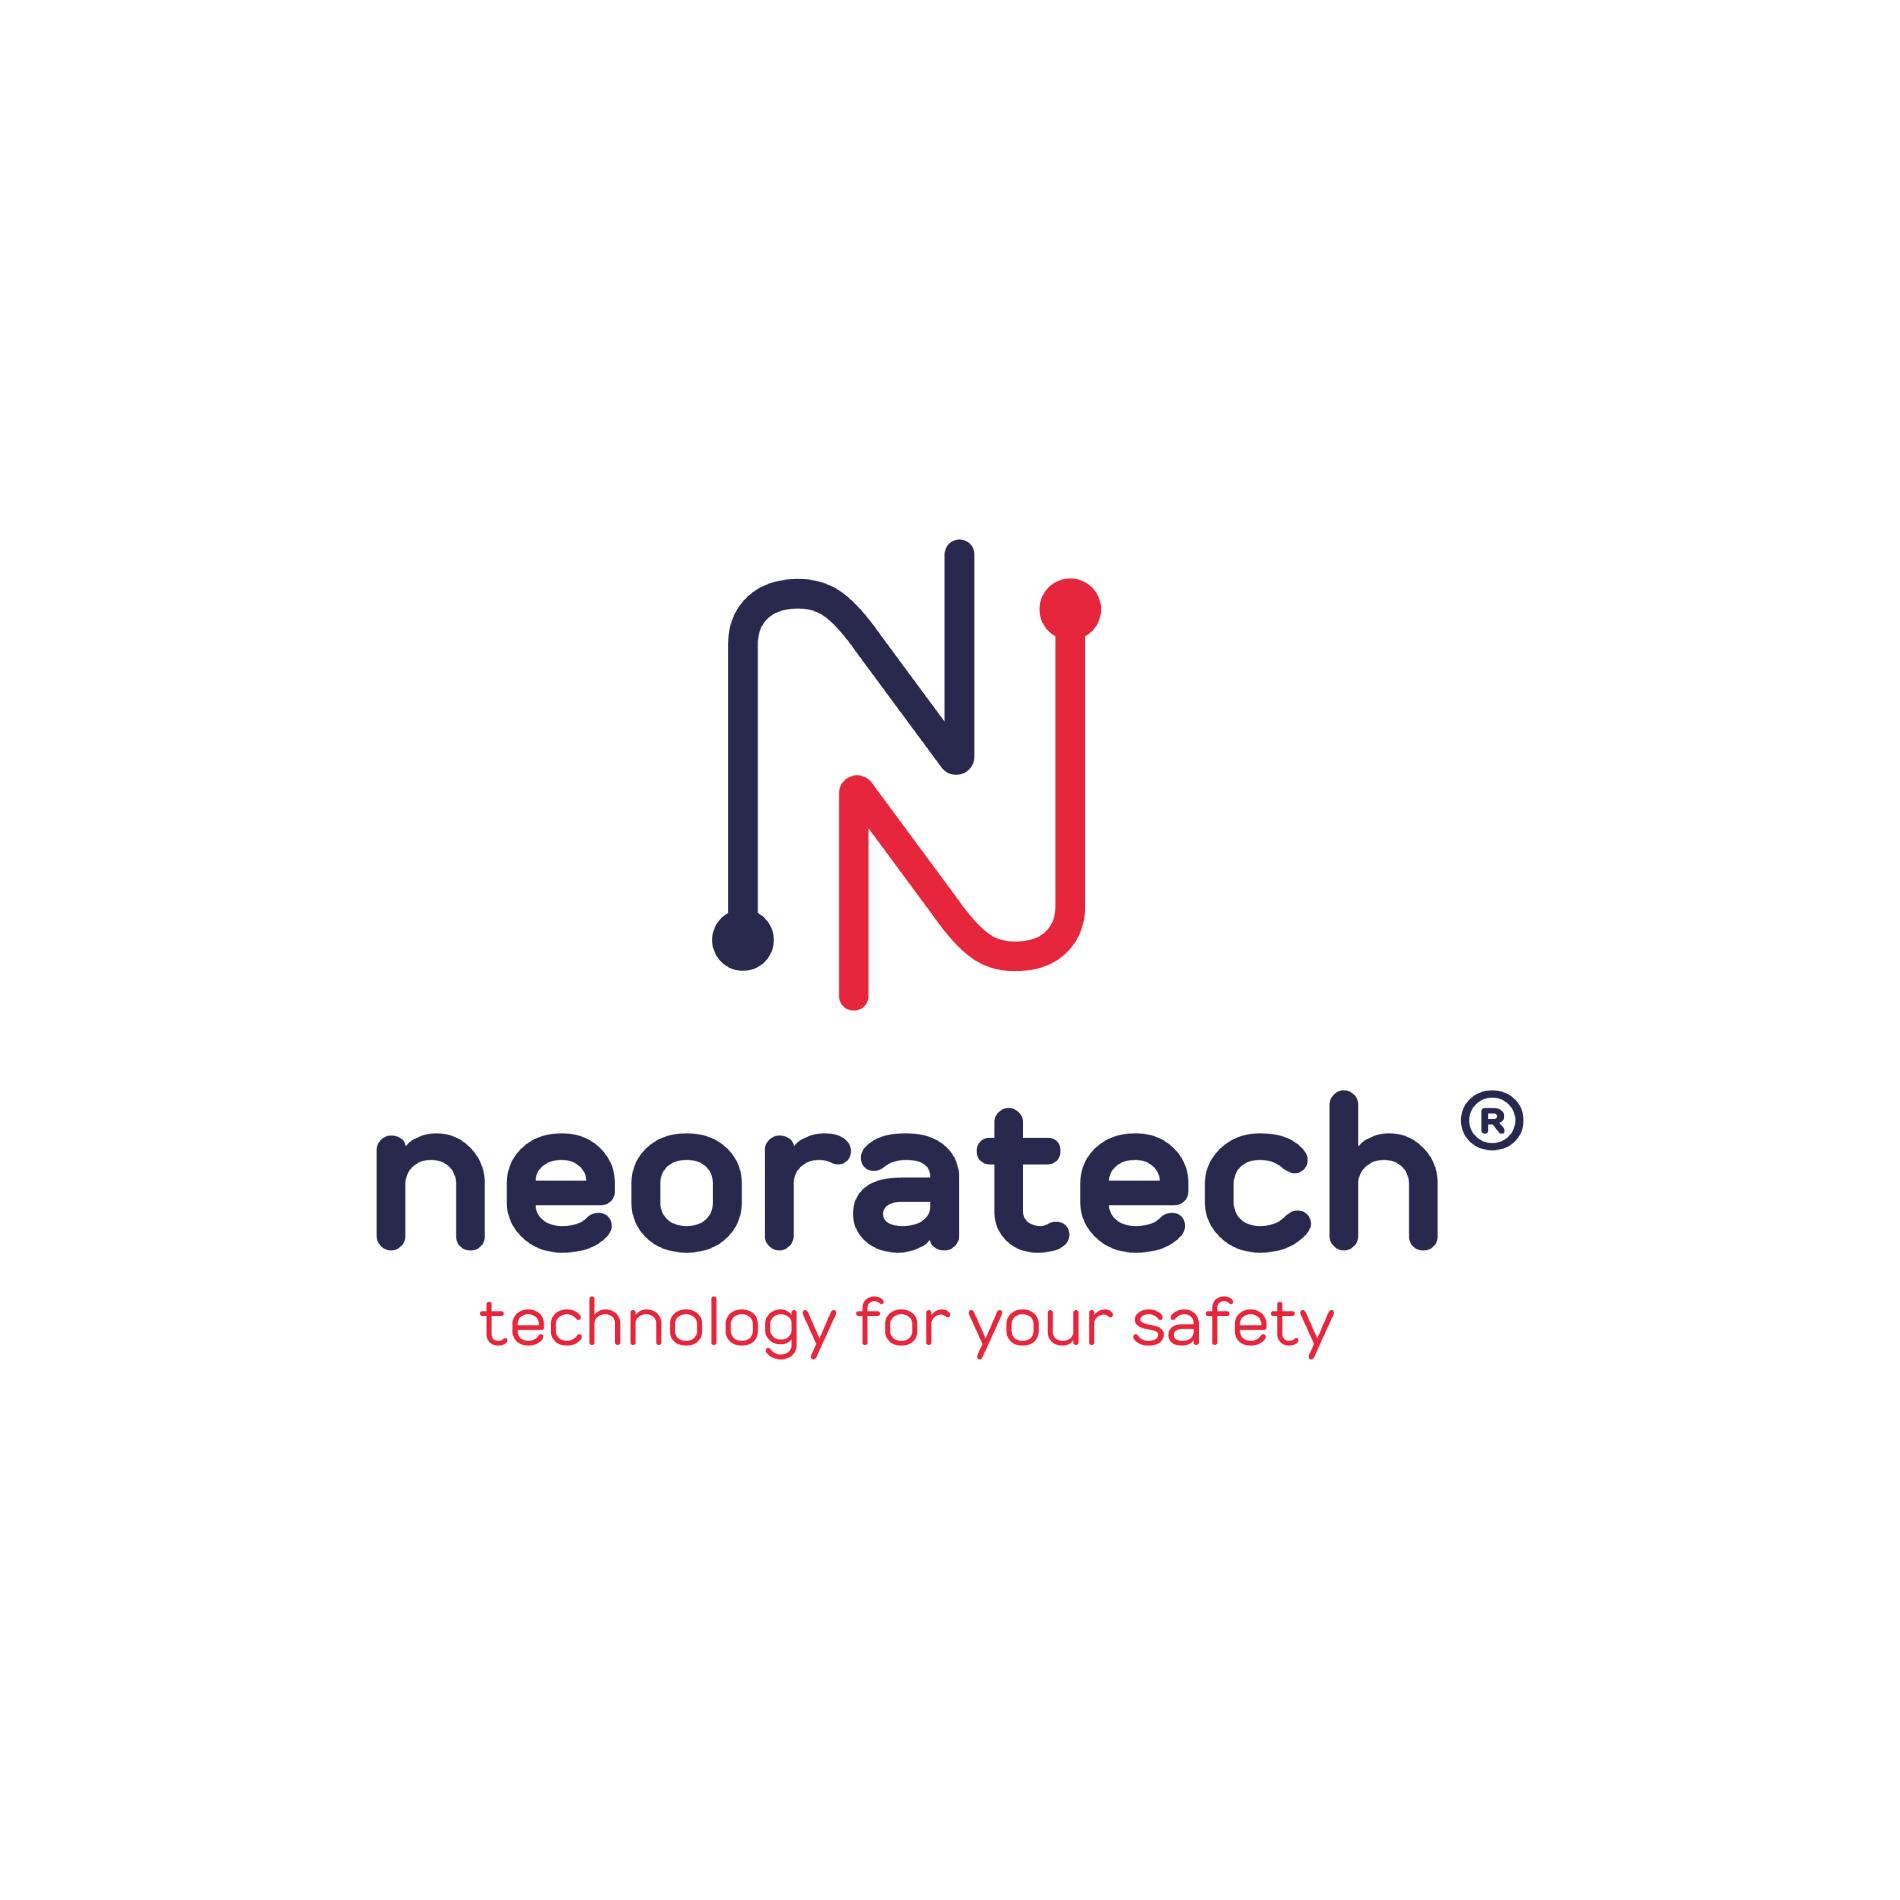 Neoratech